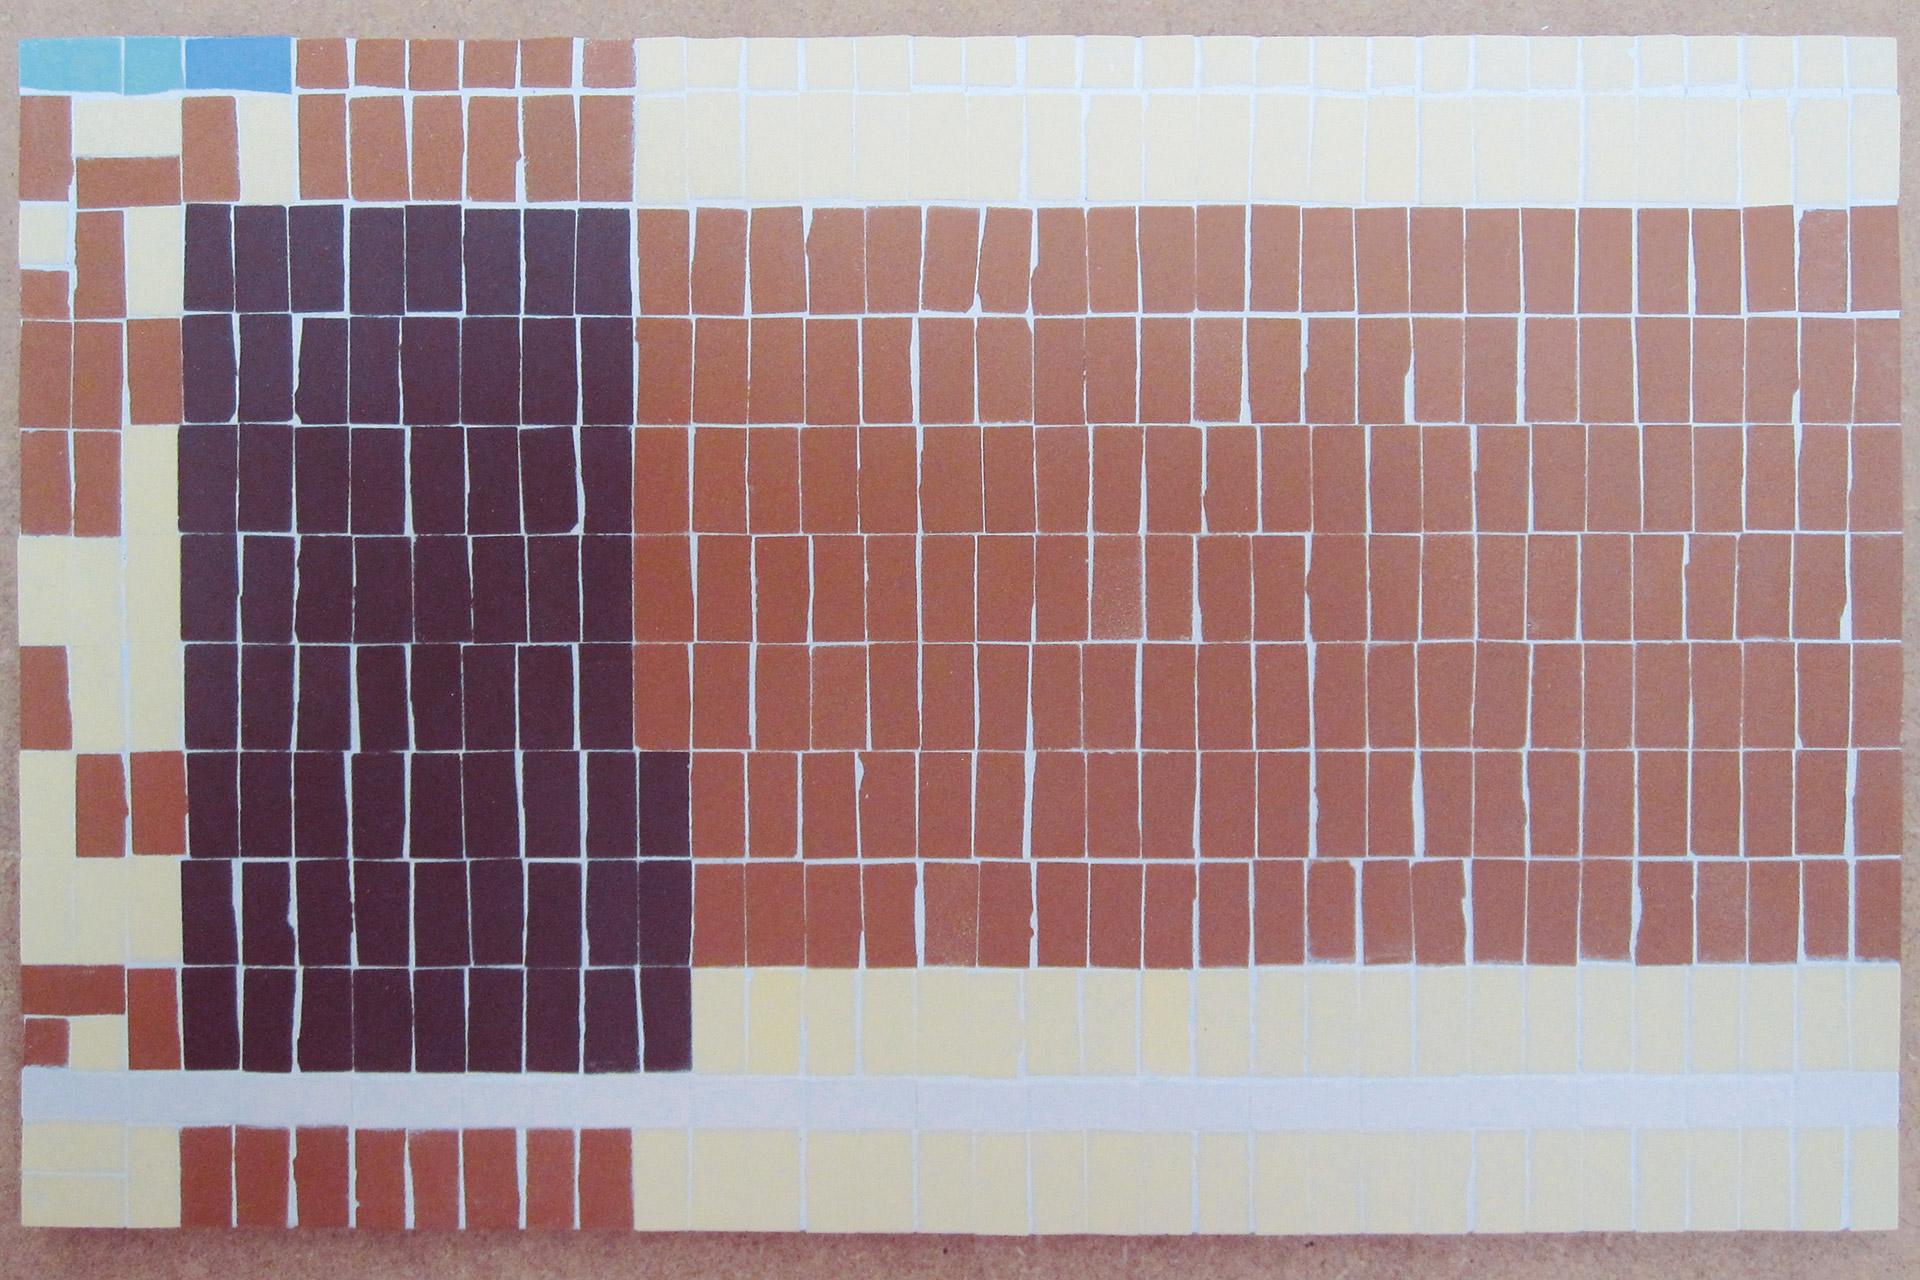 Patricia-Esquivias-Kunsthalle-Winterthur-2013-1.jpg